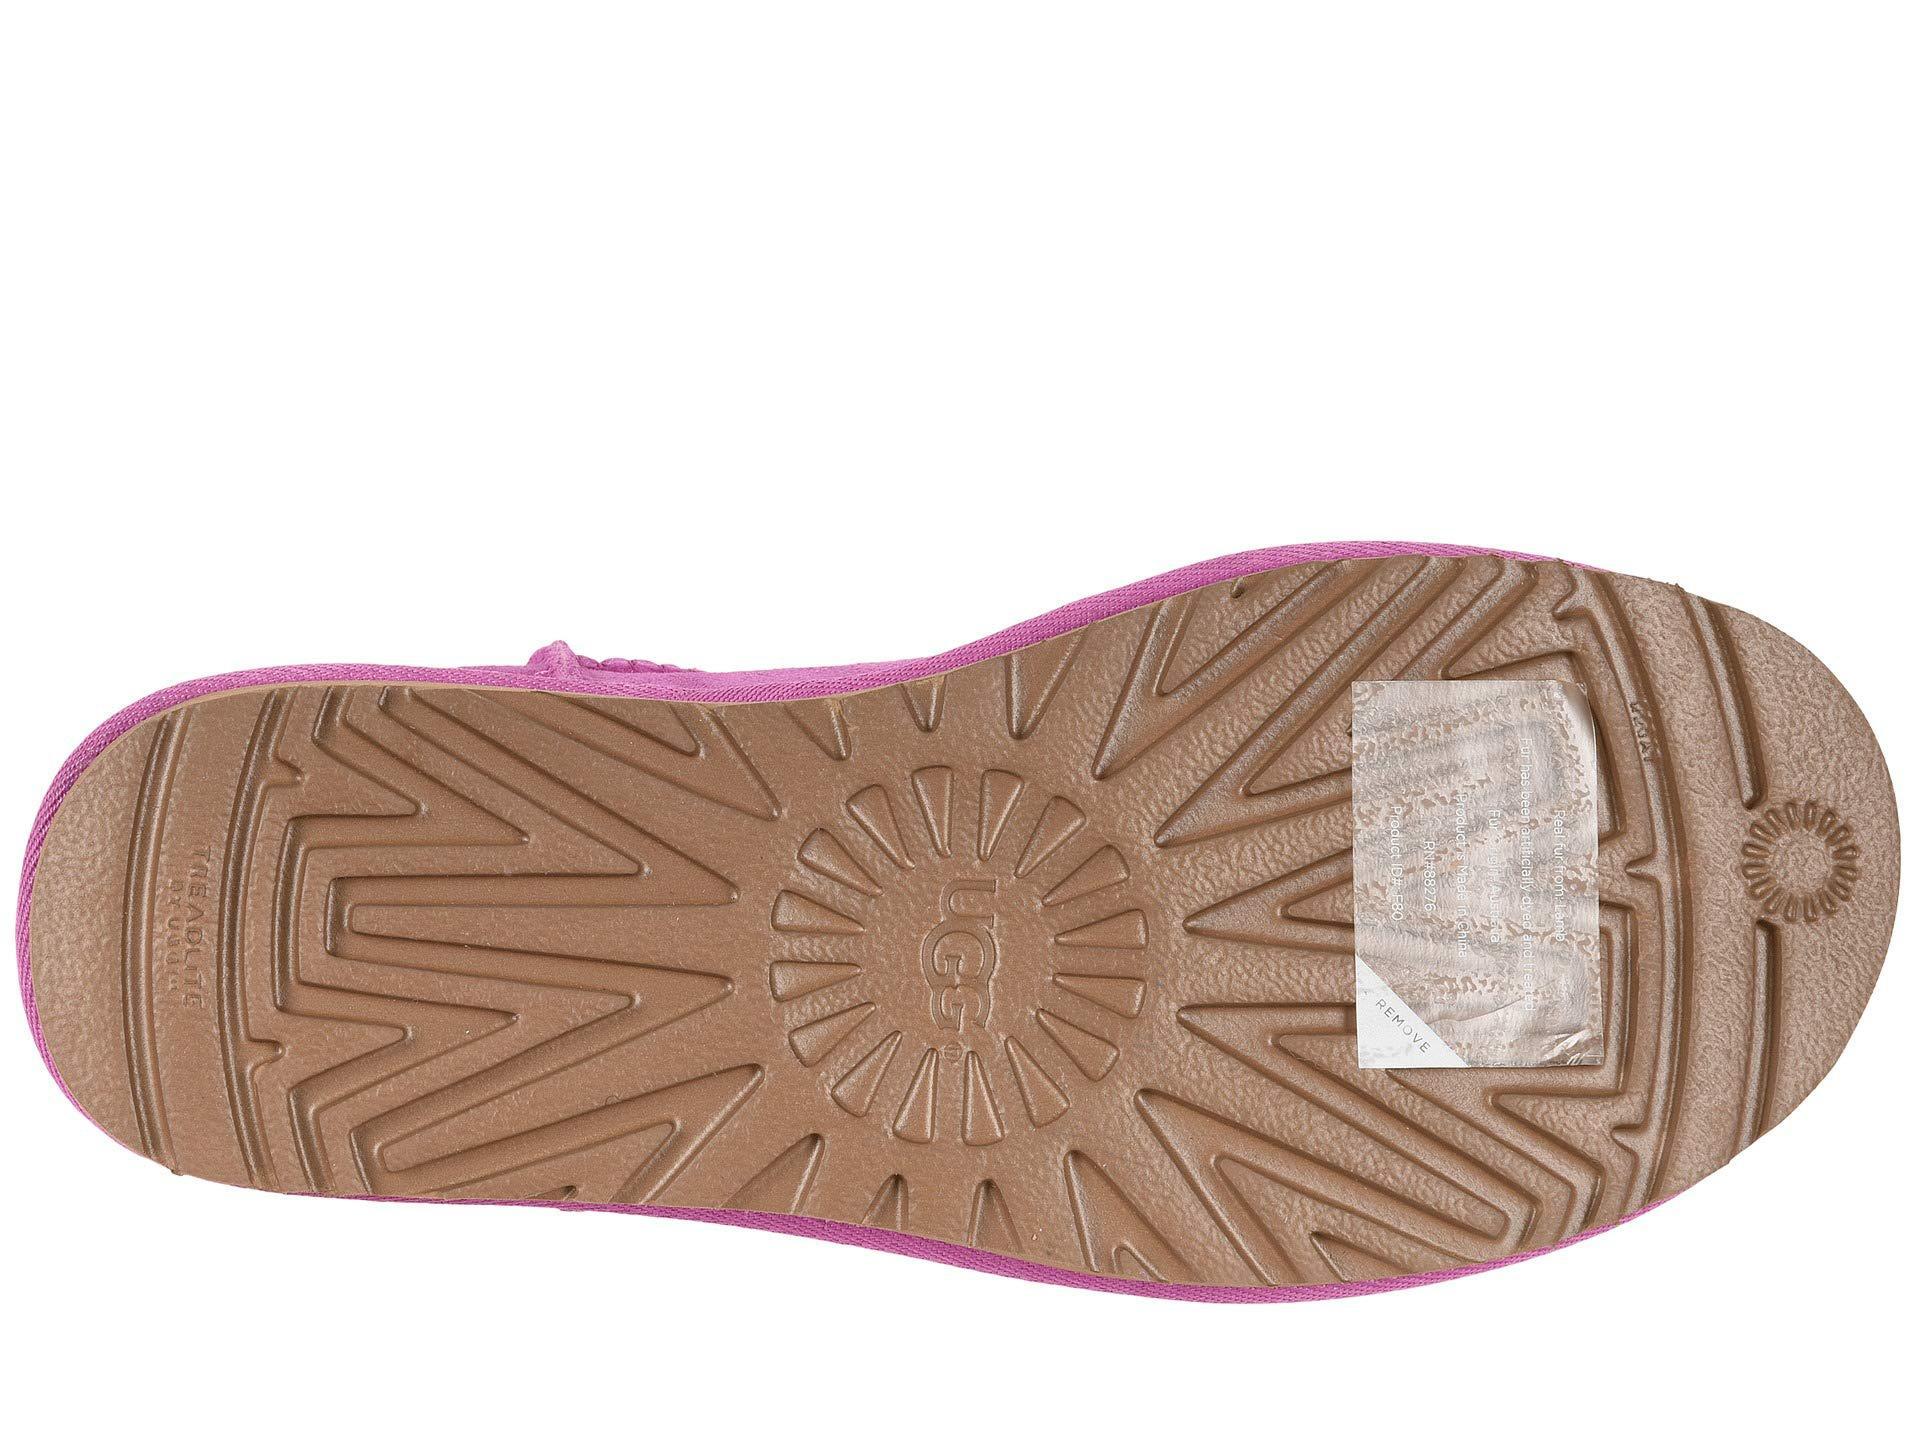 74e441ae706 UGG Classic Mini Ii (boadacious Pink) Women's Boots in Pink - Lyst